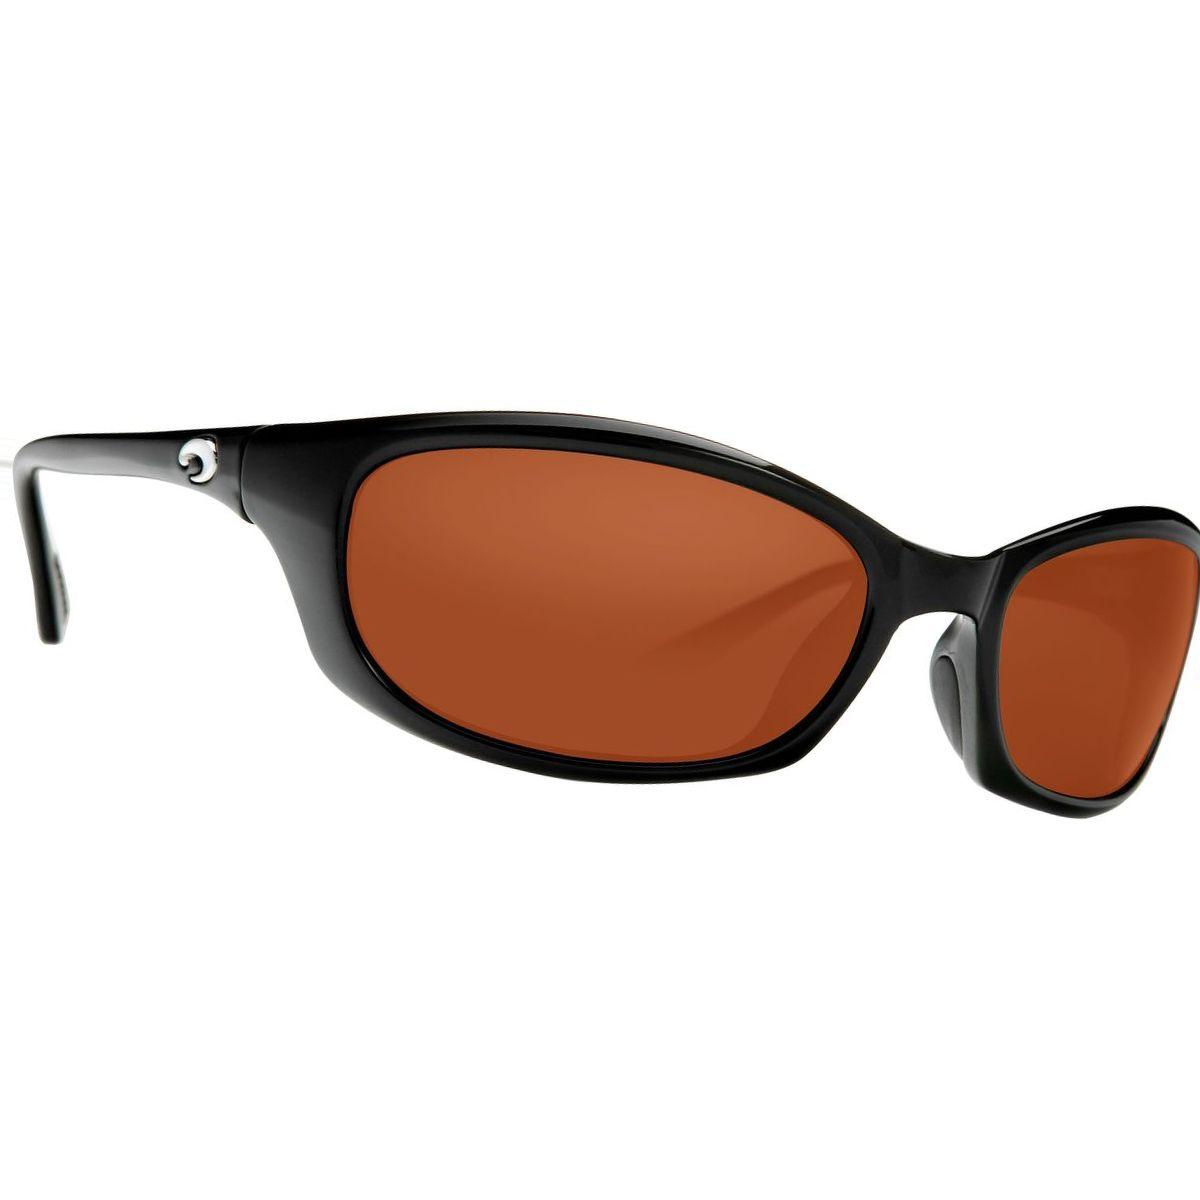 Costa Harpoon 580P Polarized Sunglasses - Women's